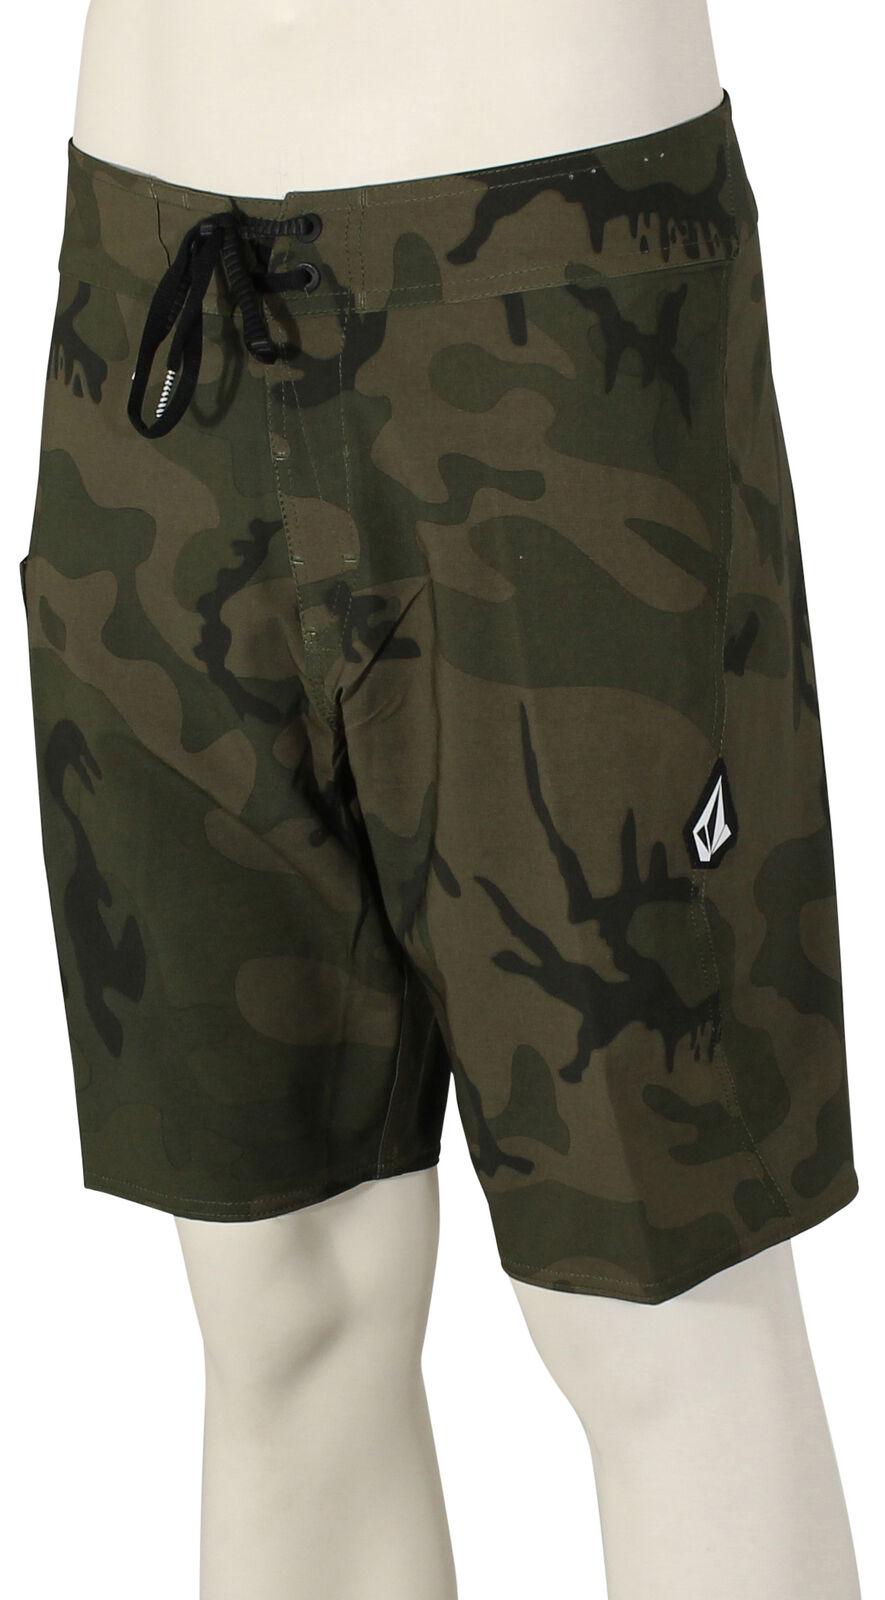 Volcom Lido Solid Mod Boardshorts - Camouflage - New